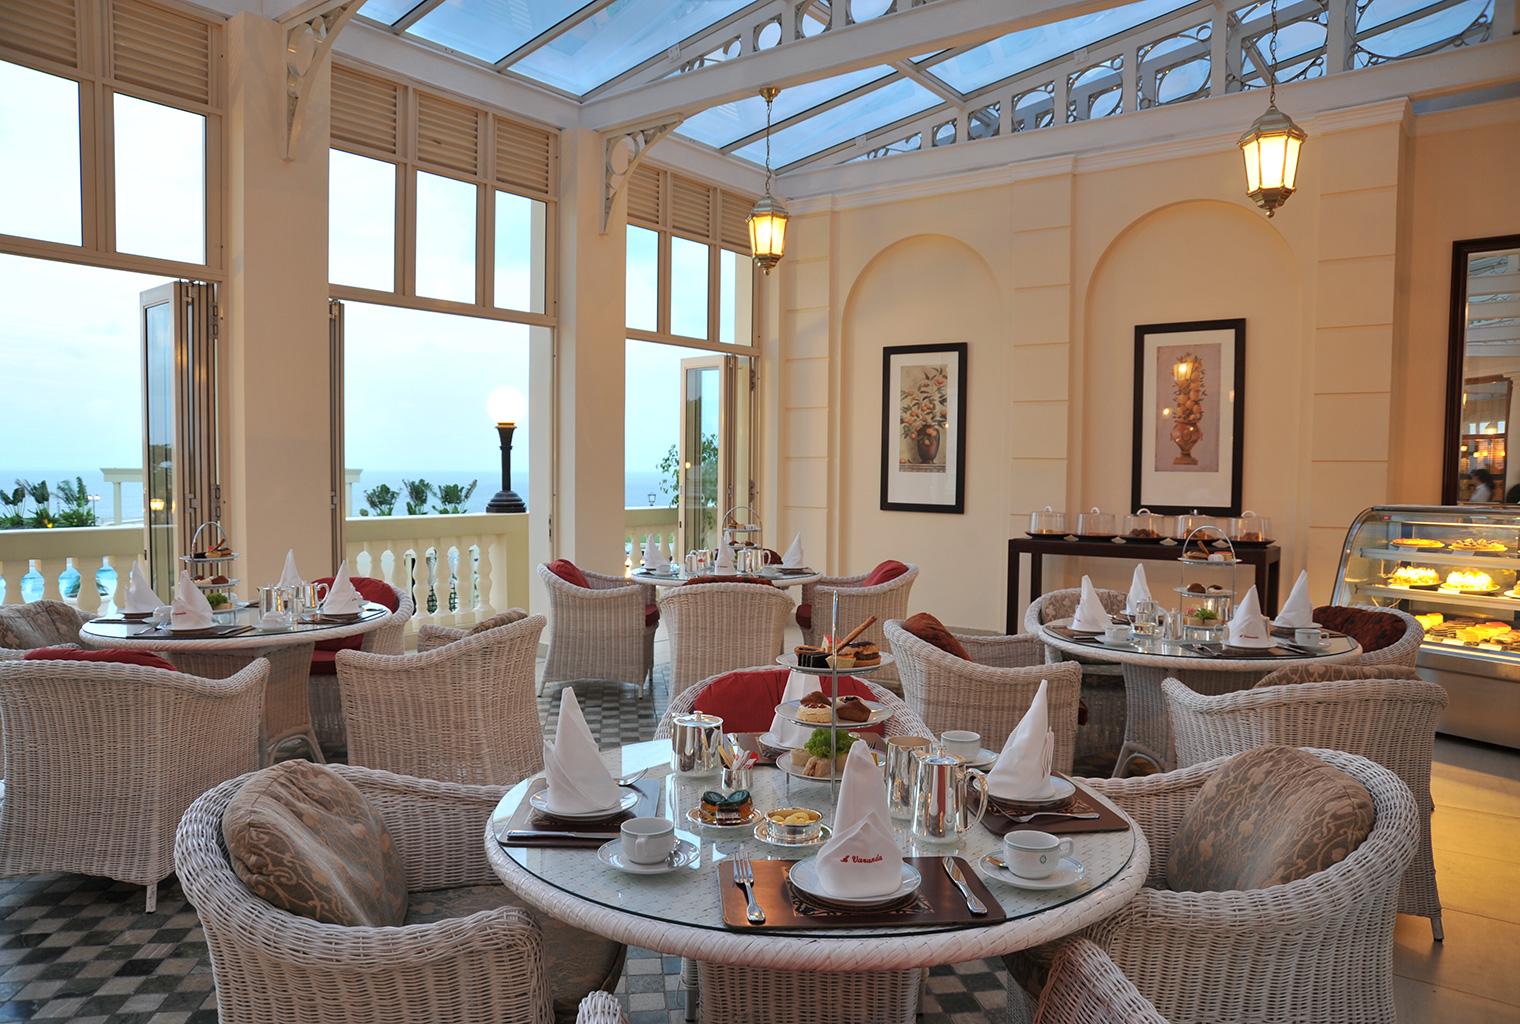 Polana-Serena-Hotel-Mozambique-Lounge